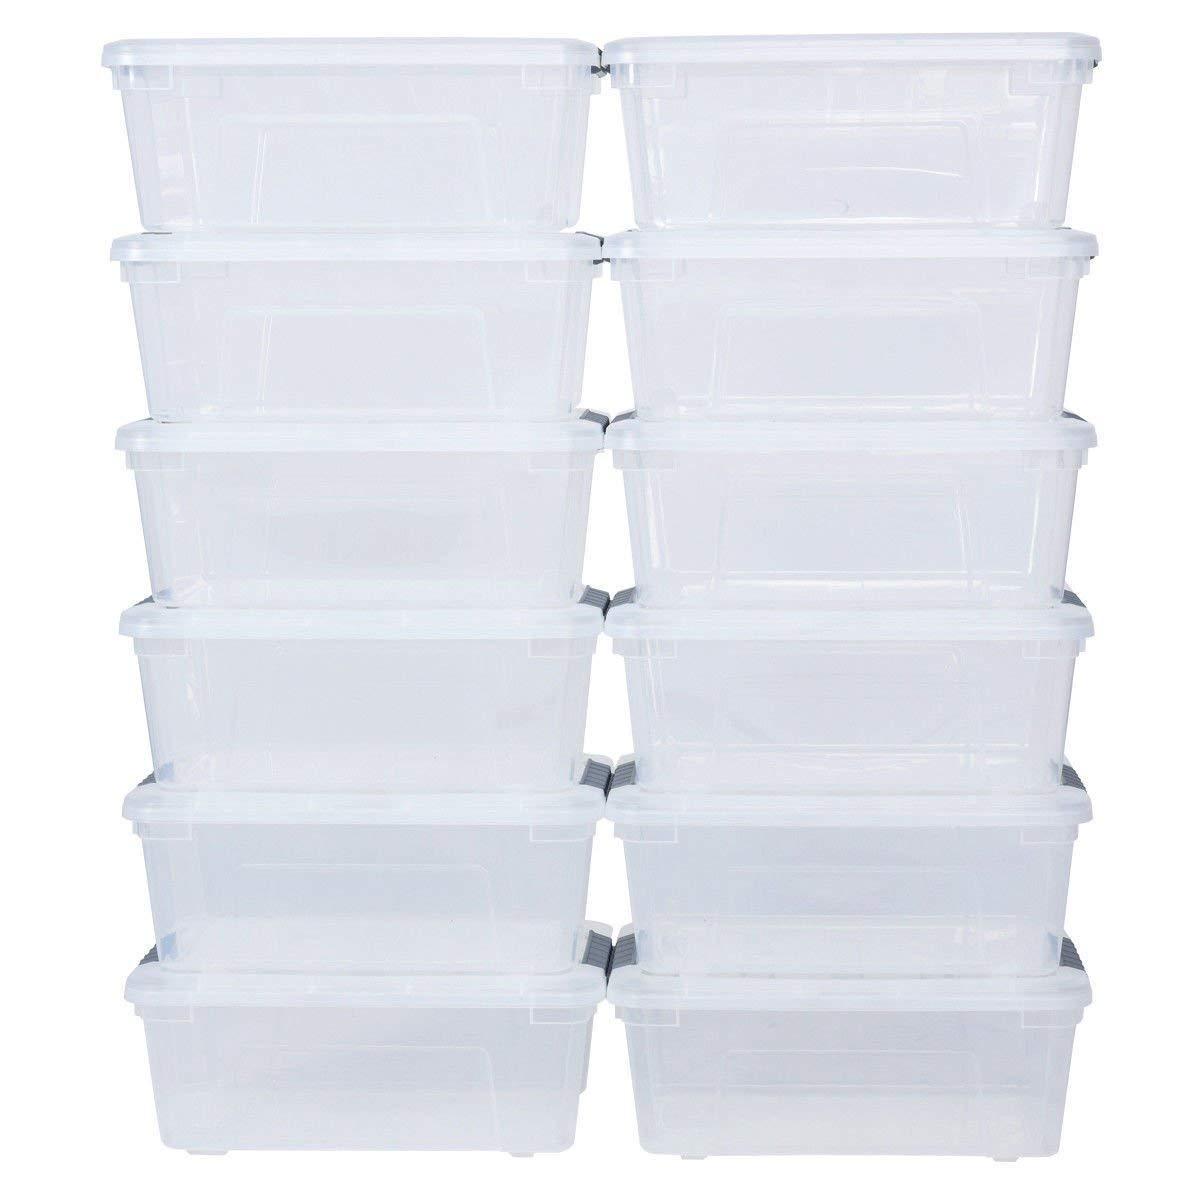 Cypressshop Plastic Storage Tote Boxes 144 Quart 156Liter Latch Stack Storage Box Transparent Tubs Bins Latches Handles Stackable Set of 12 Home Organizer